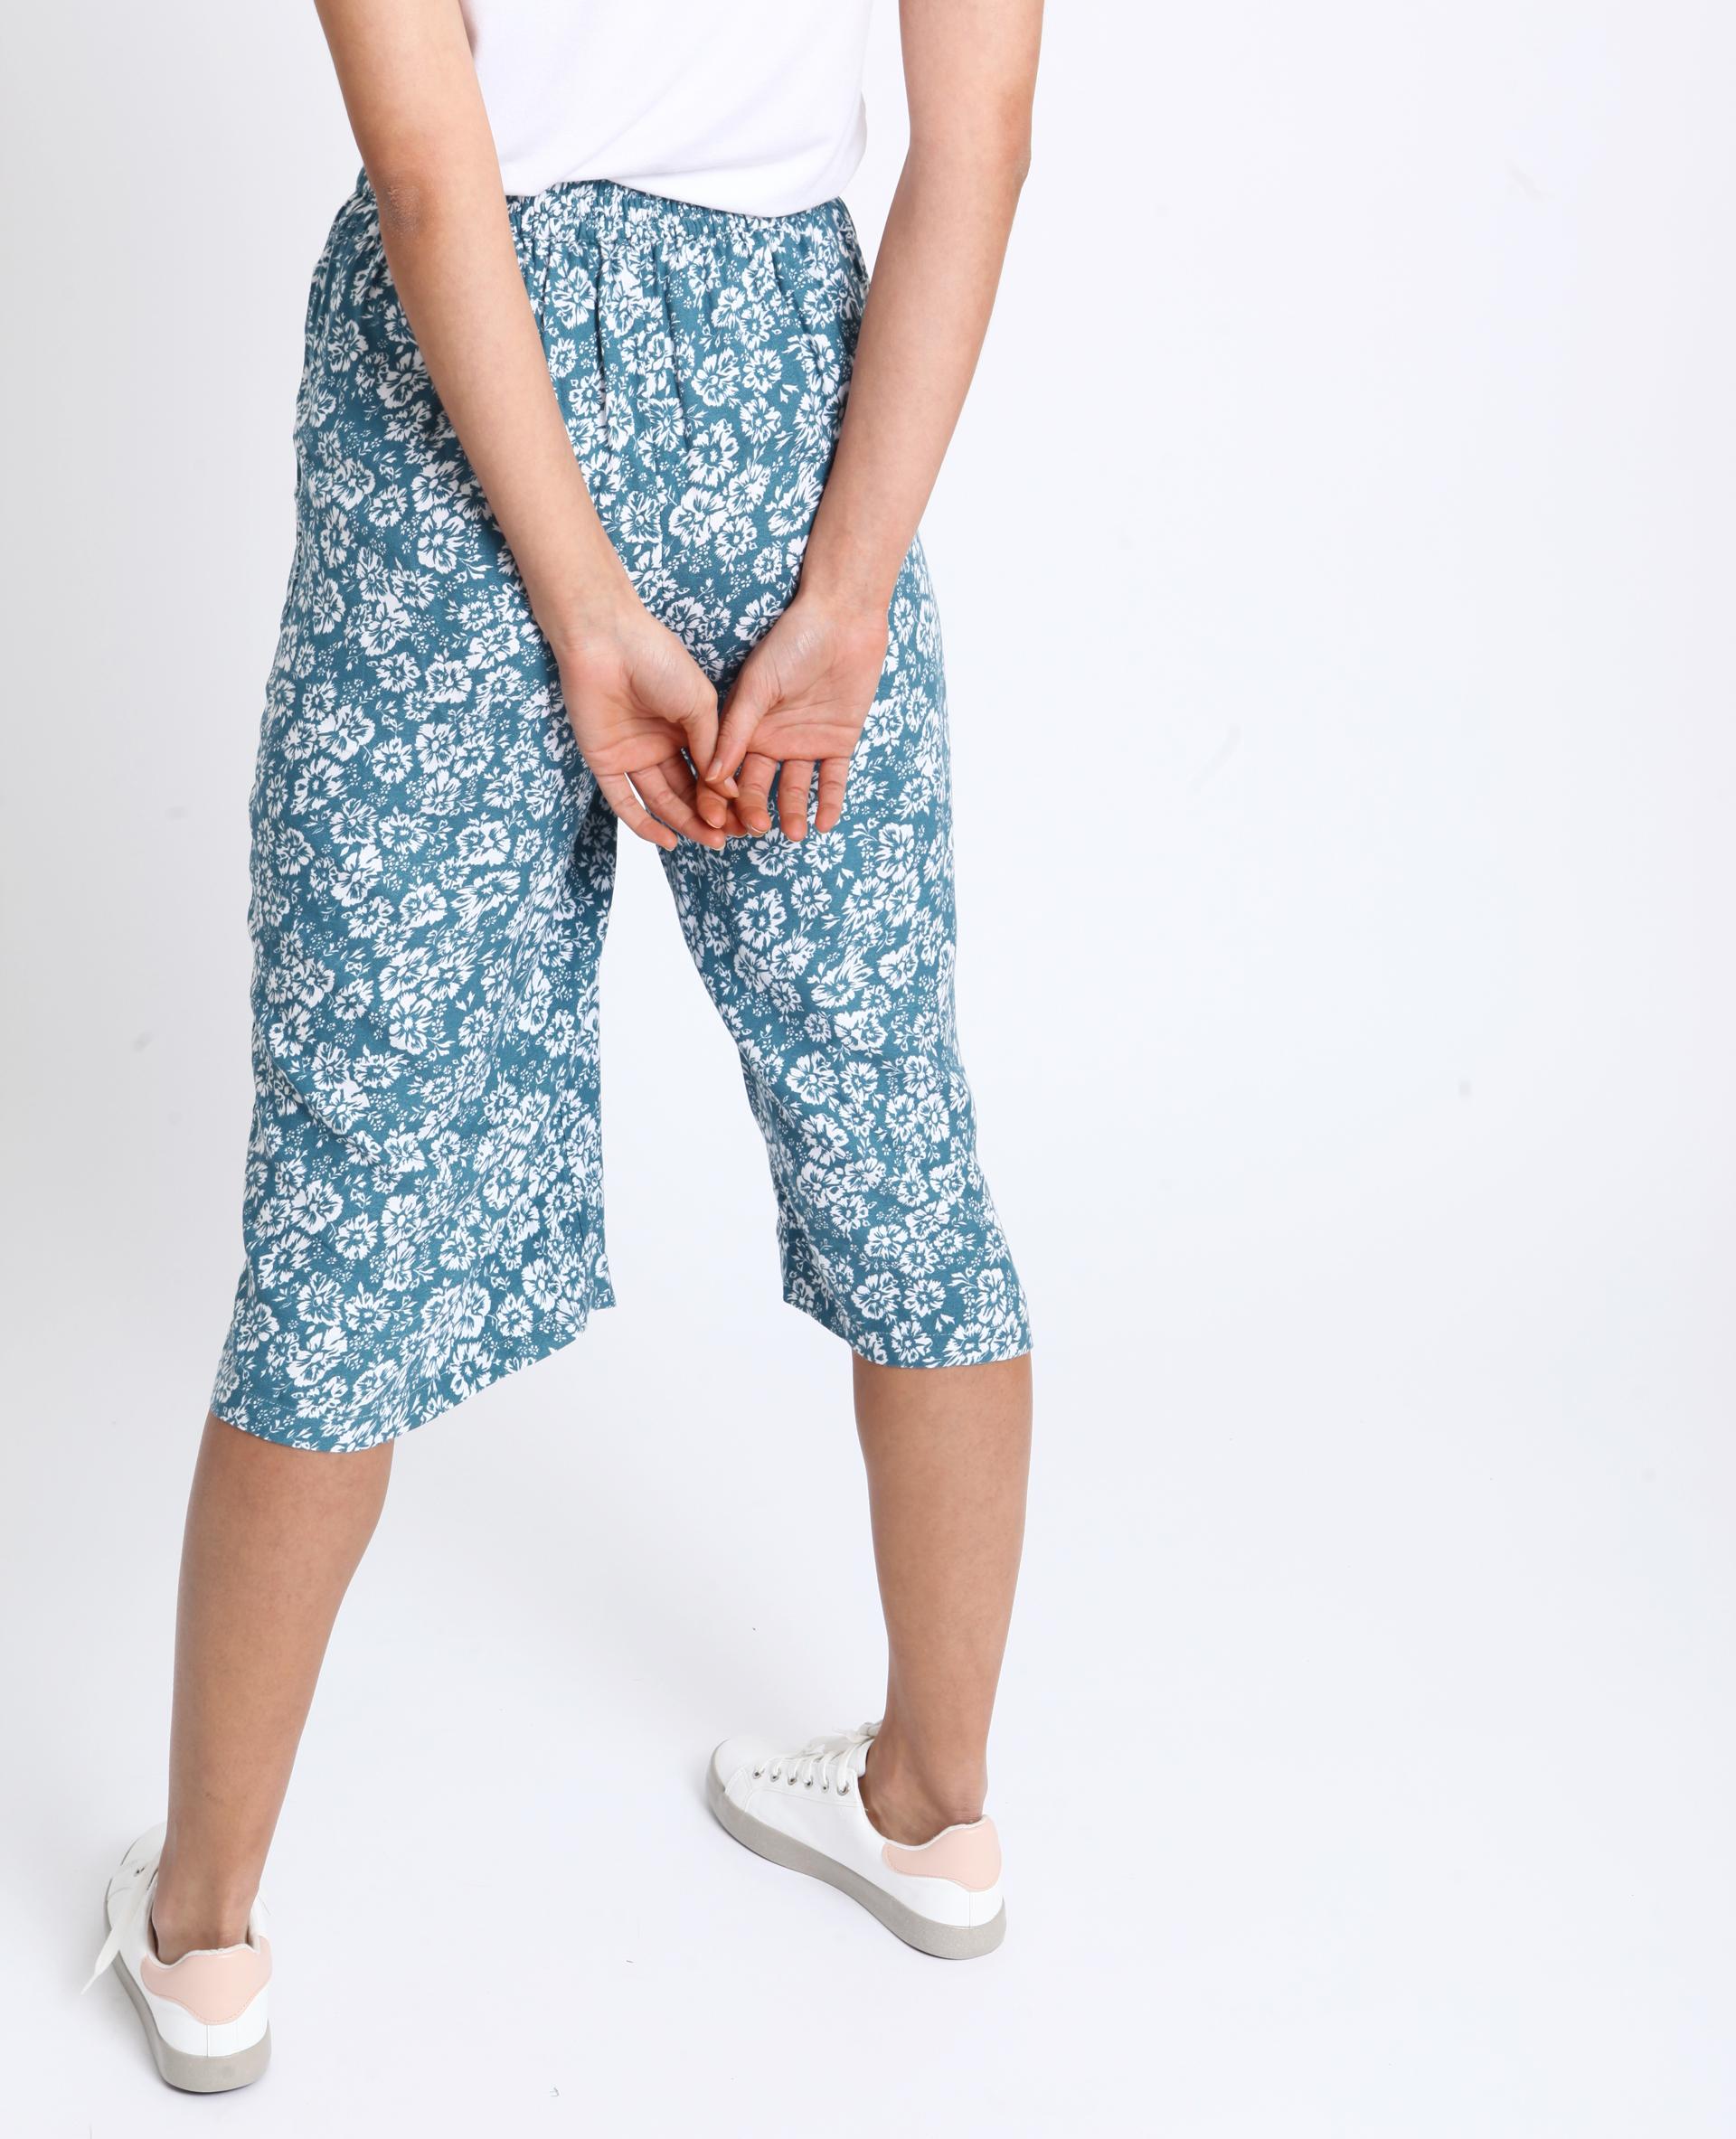 Jupe culotte à fleurs blanc - Pimkie